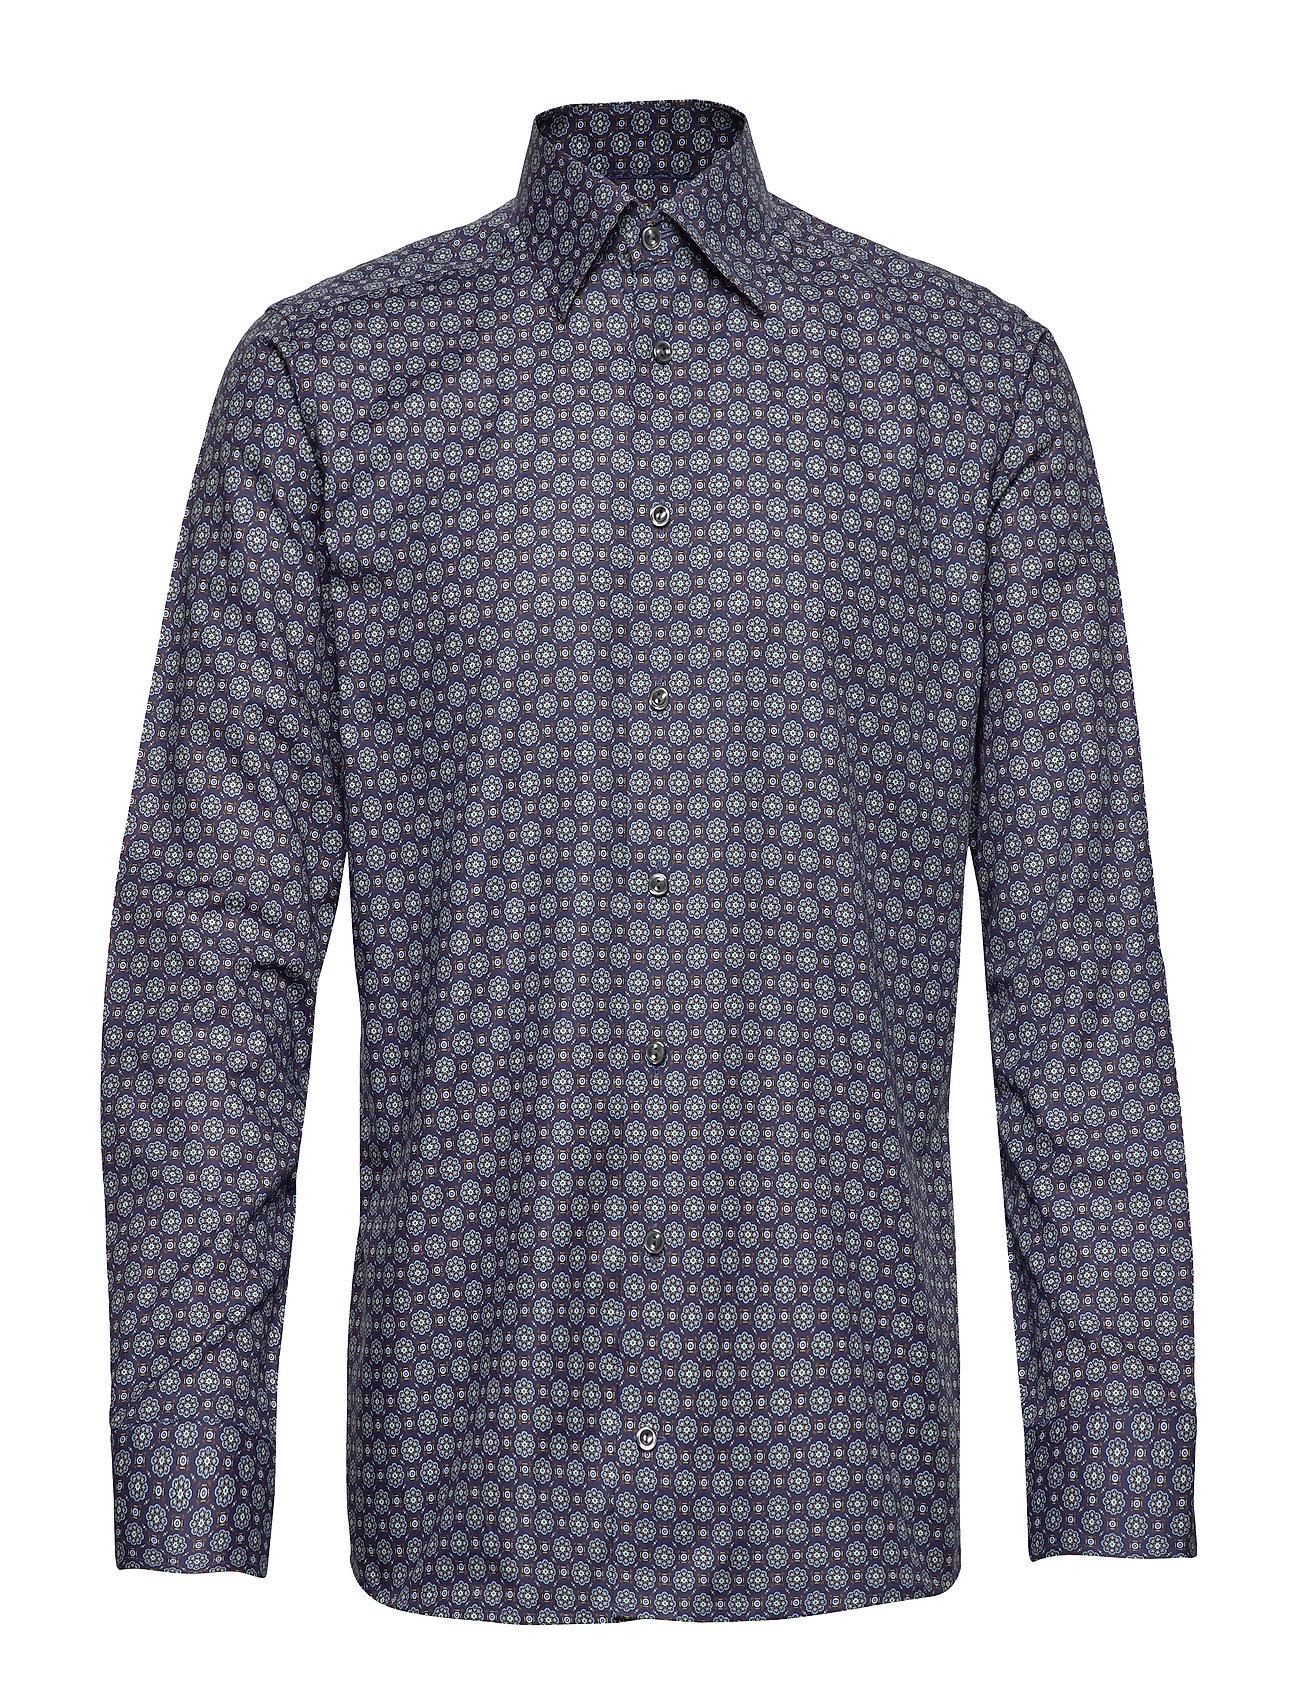 Eton Navy Medallion Print Twill Shirt - BLUE